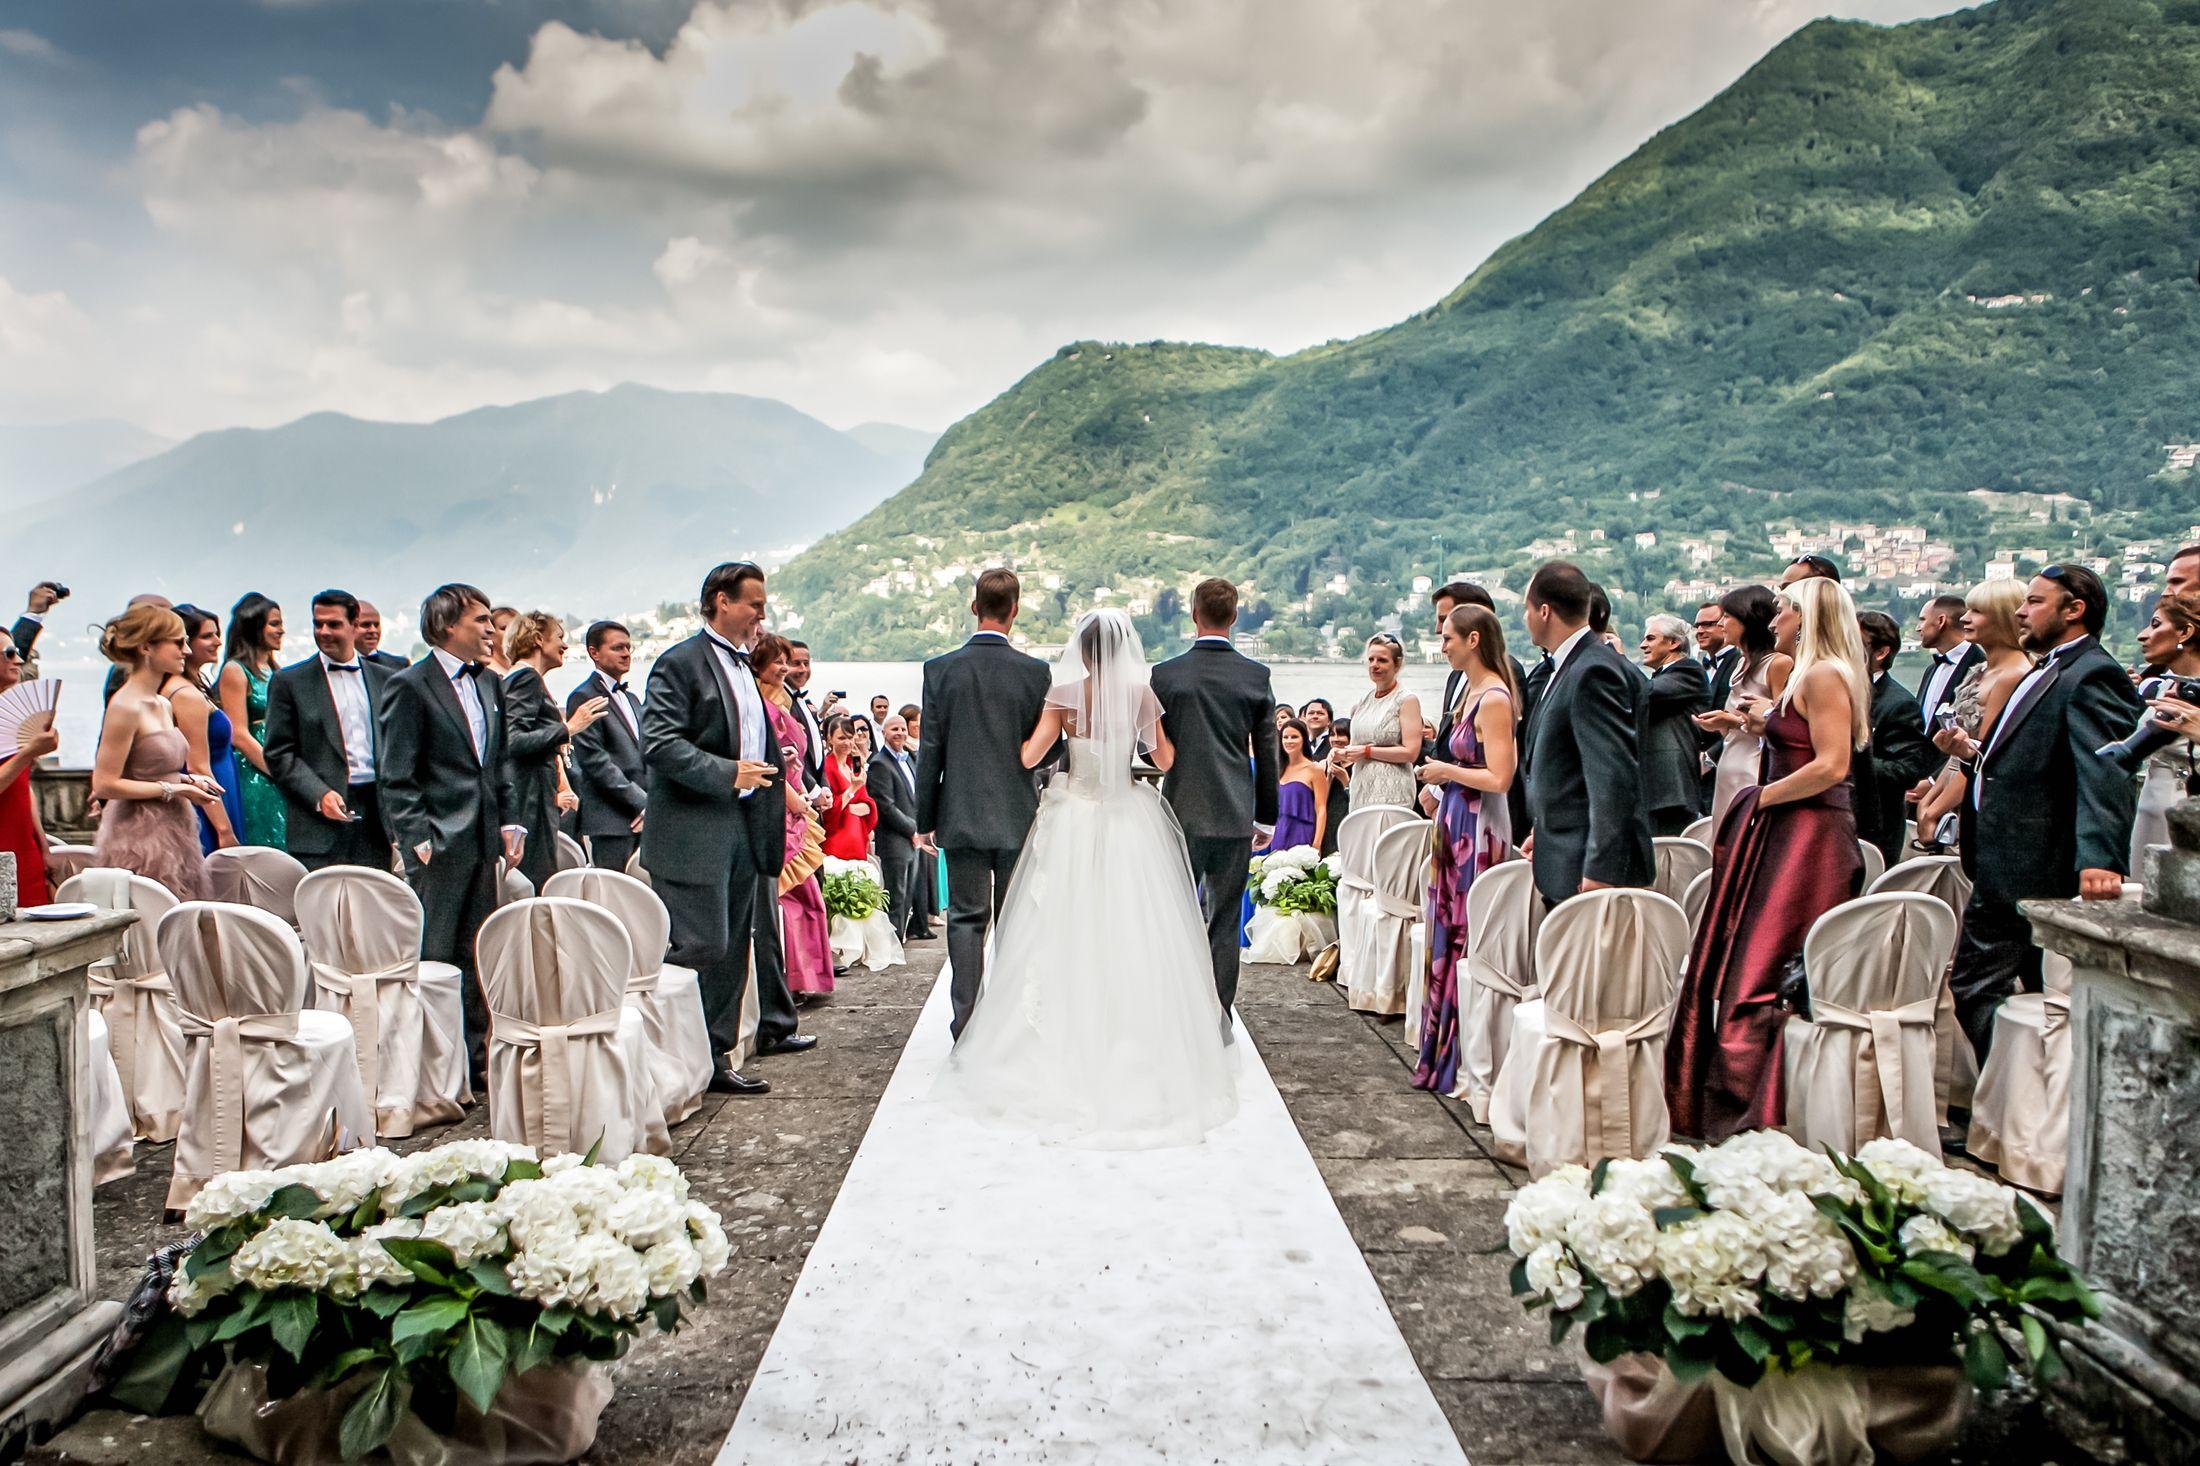 Matrimonio da favola, i turisti scelgono l'Italia